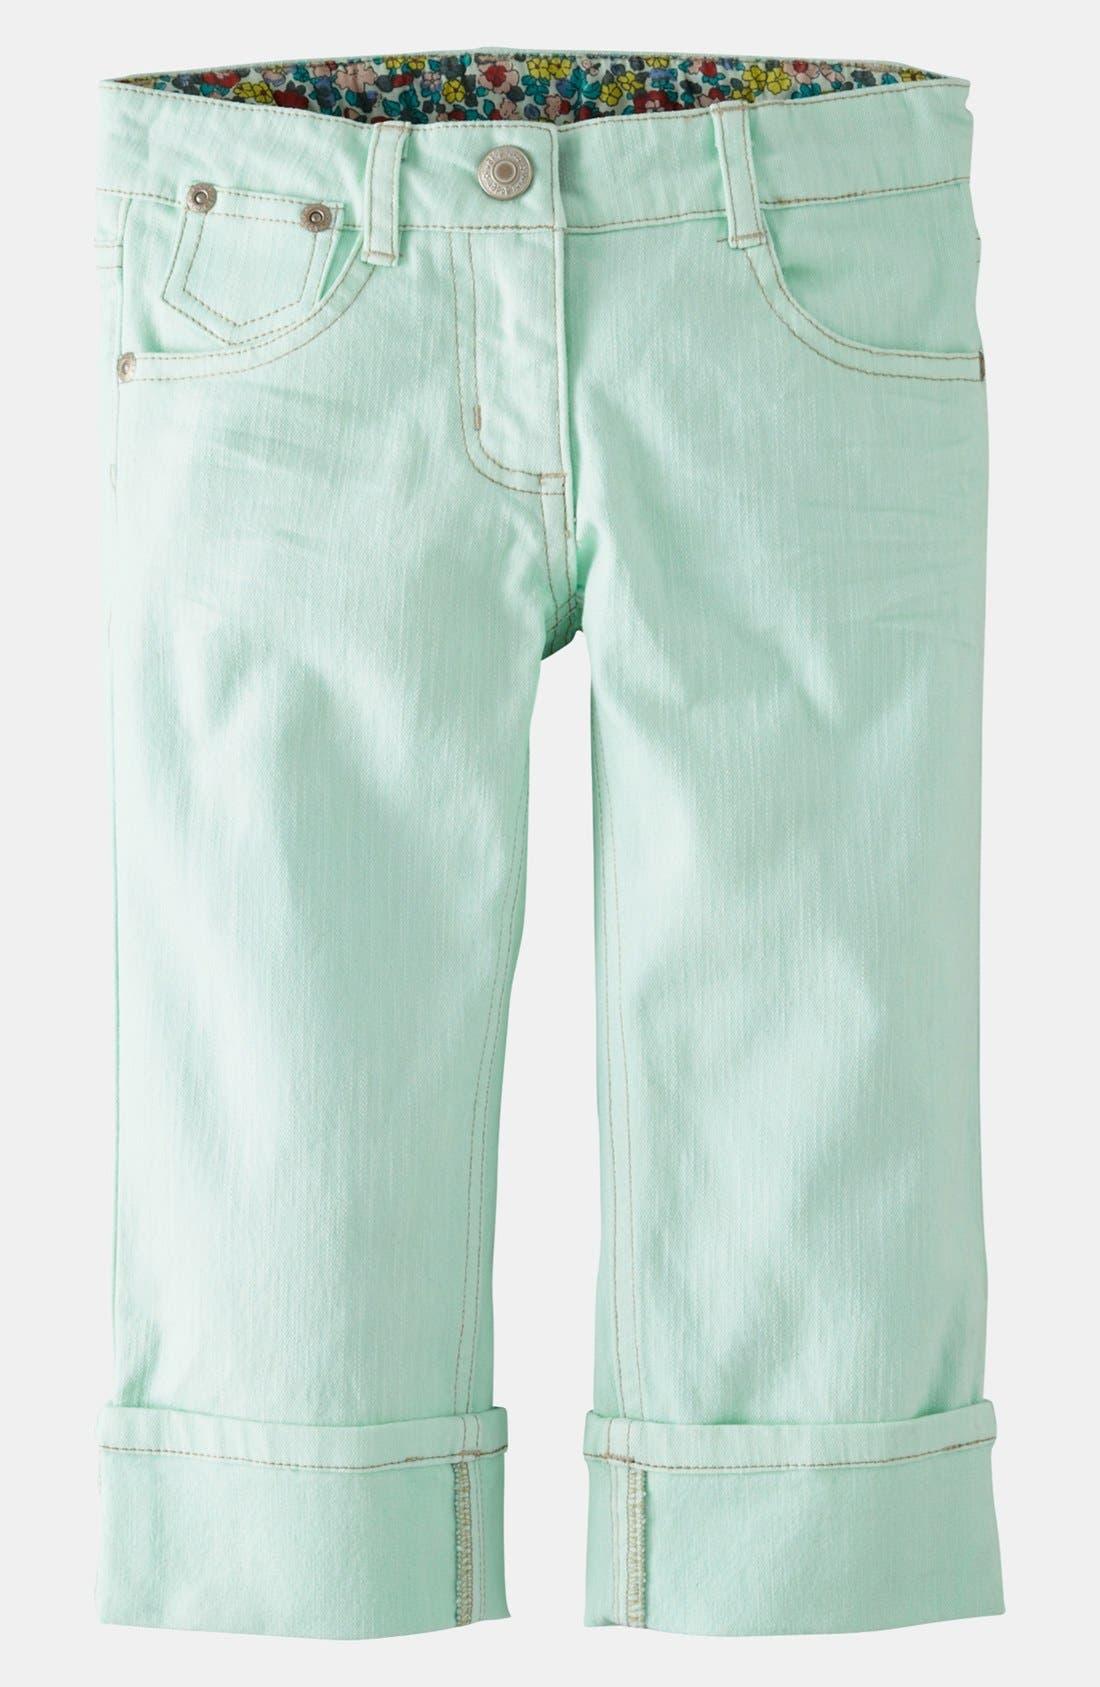 Alternate Image 1 Selected - Mini Boden Crop Jeans (Toddler, Little Girls & Big Girls)